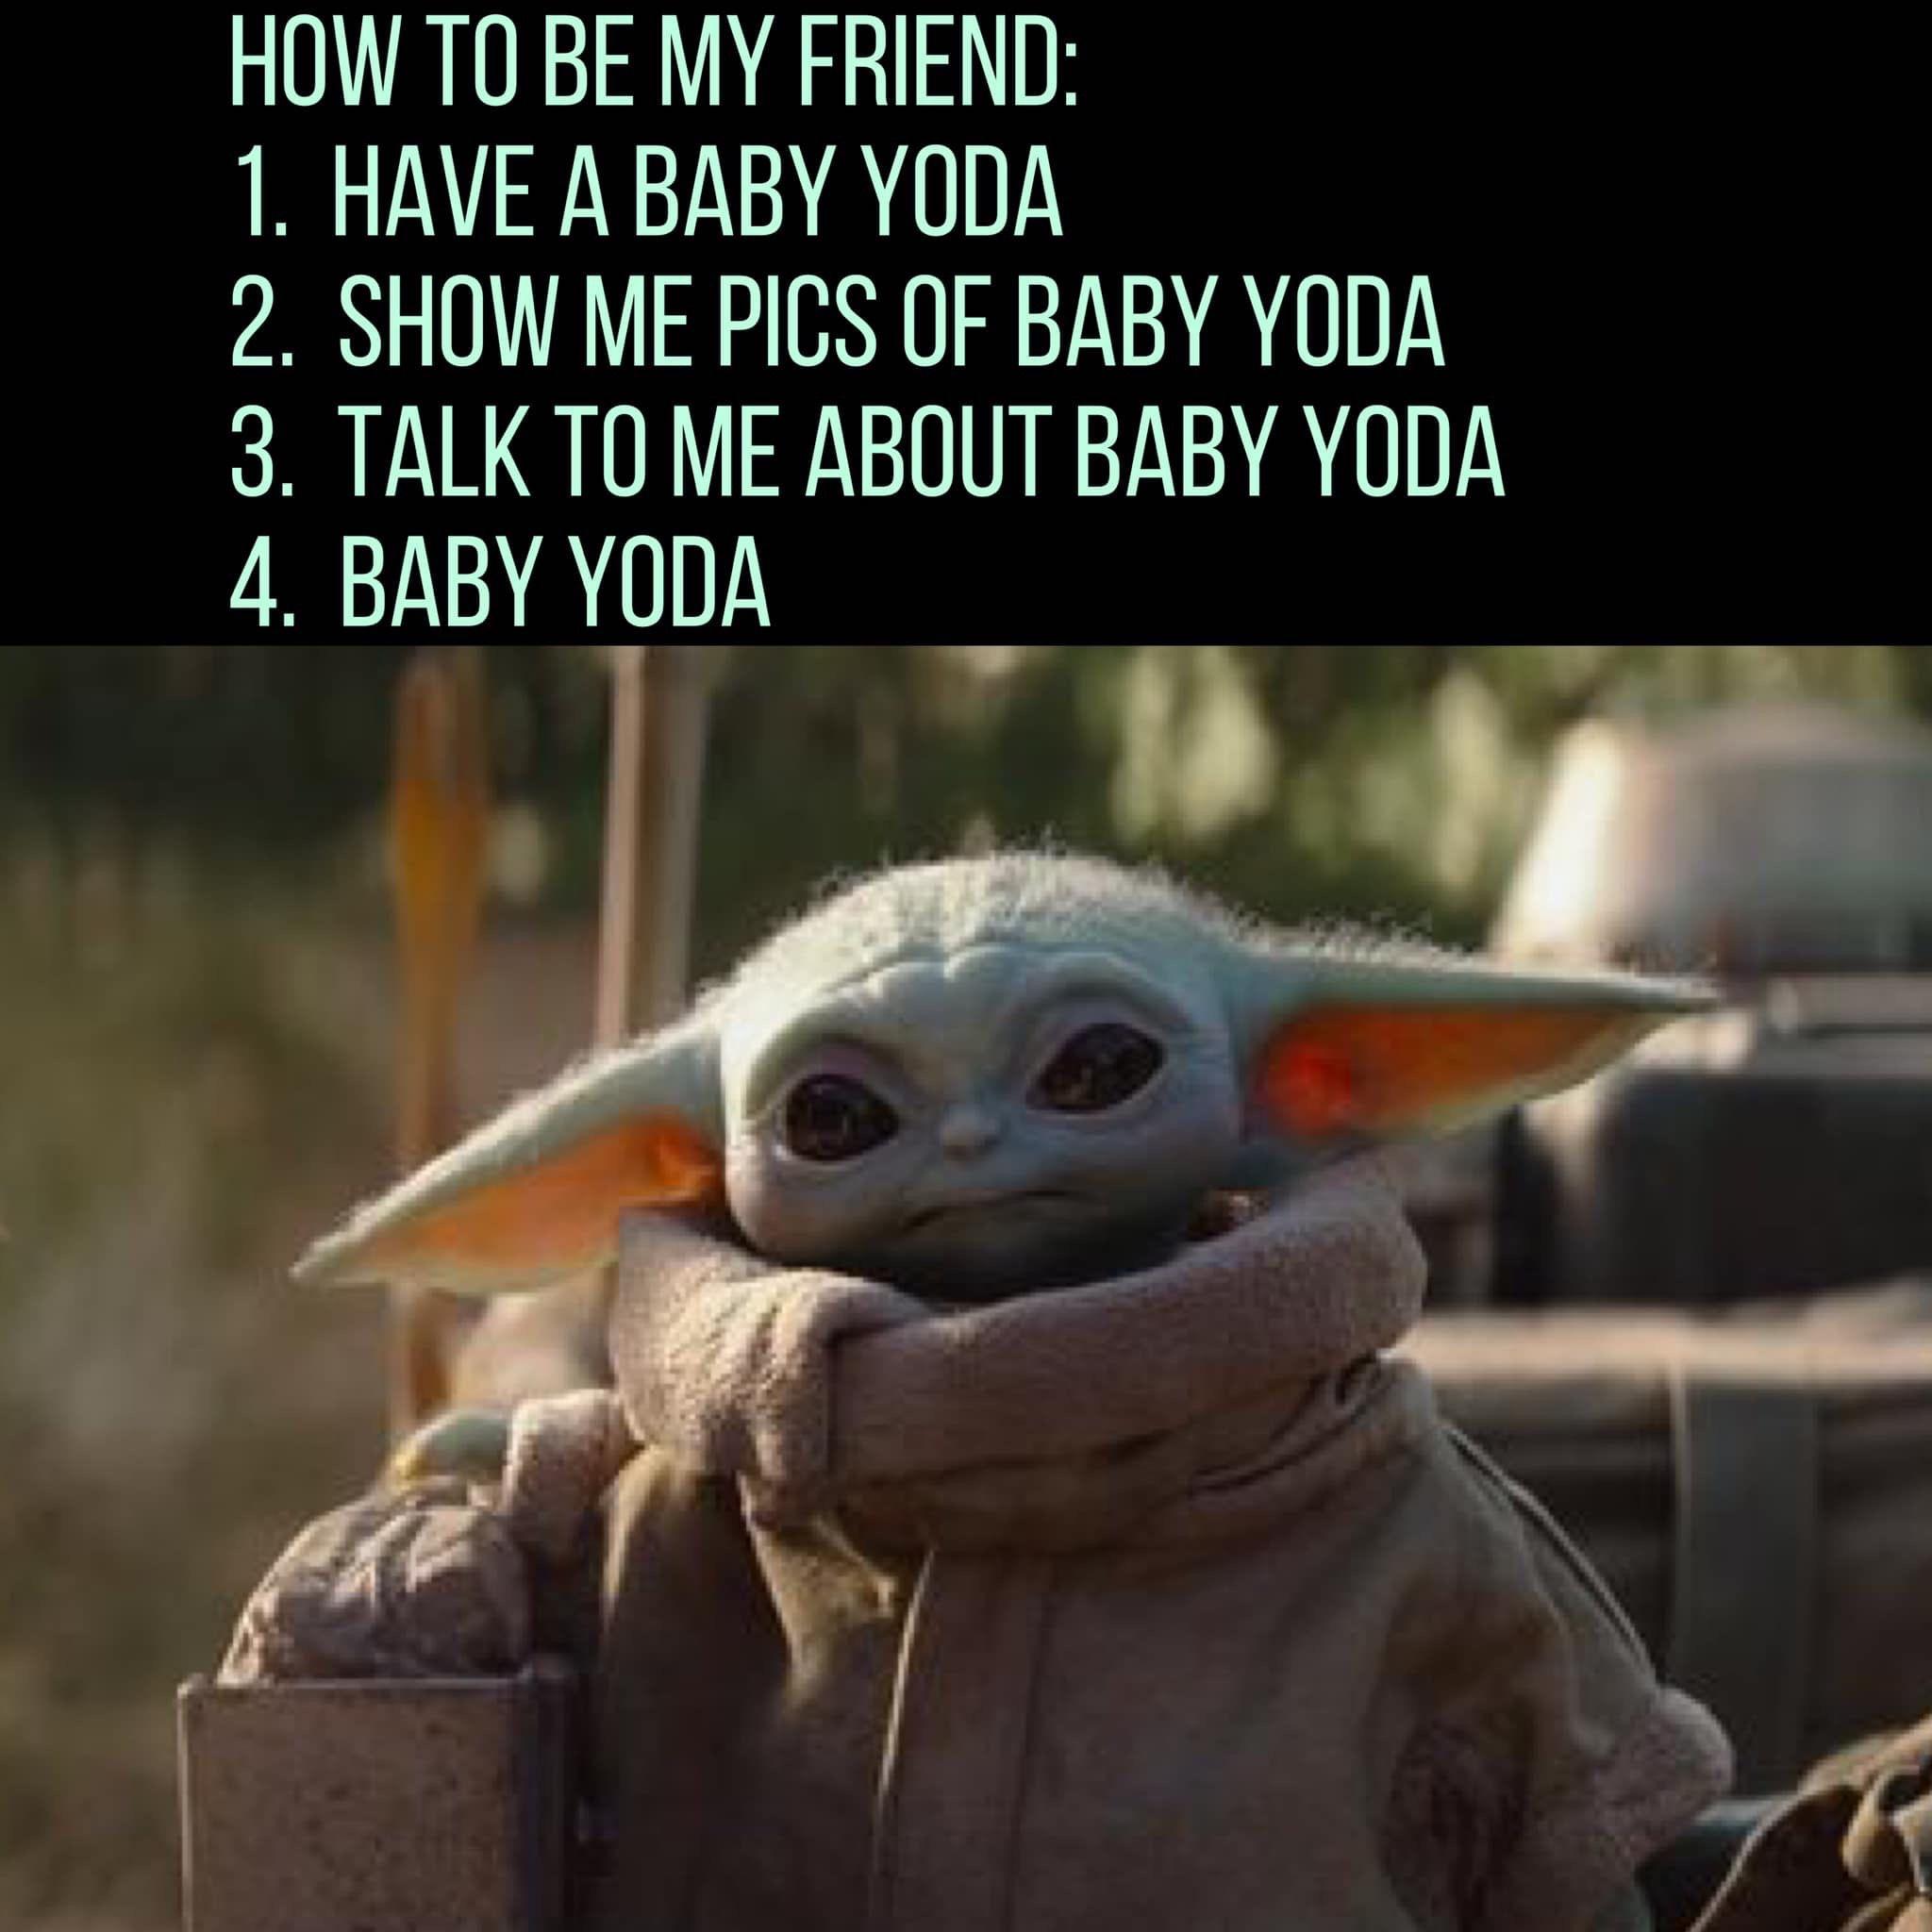 Pin By Nichole Caulk On Geek Pics For The Geek In Us All Yoda Funny Yoda Meme Funny Baby Memes